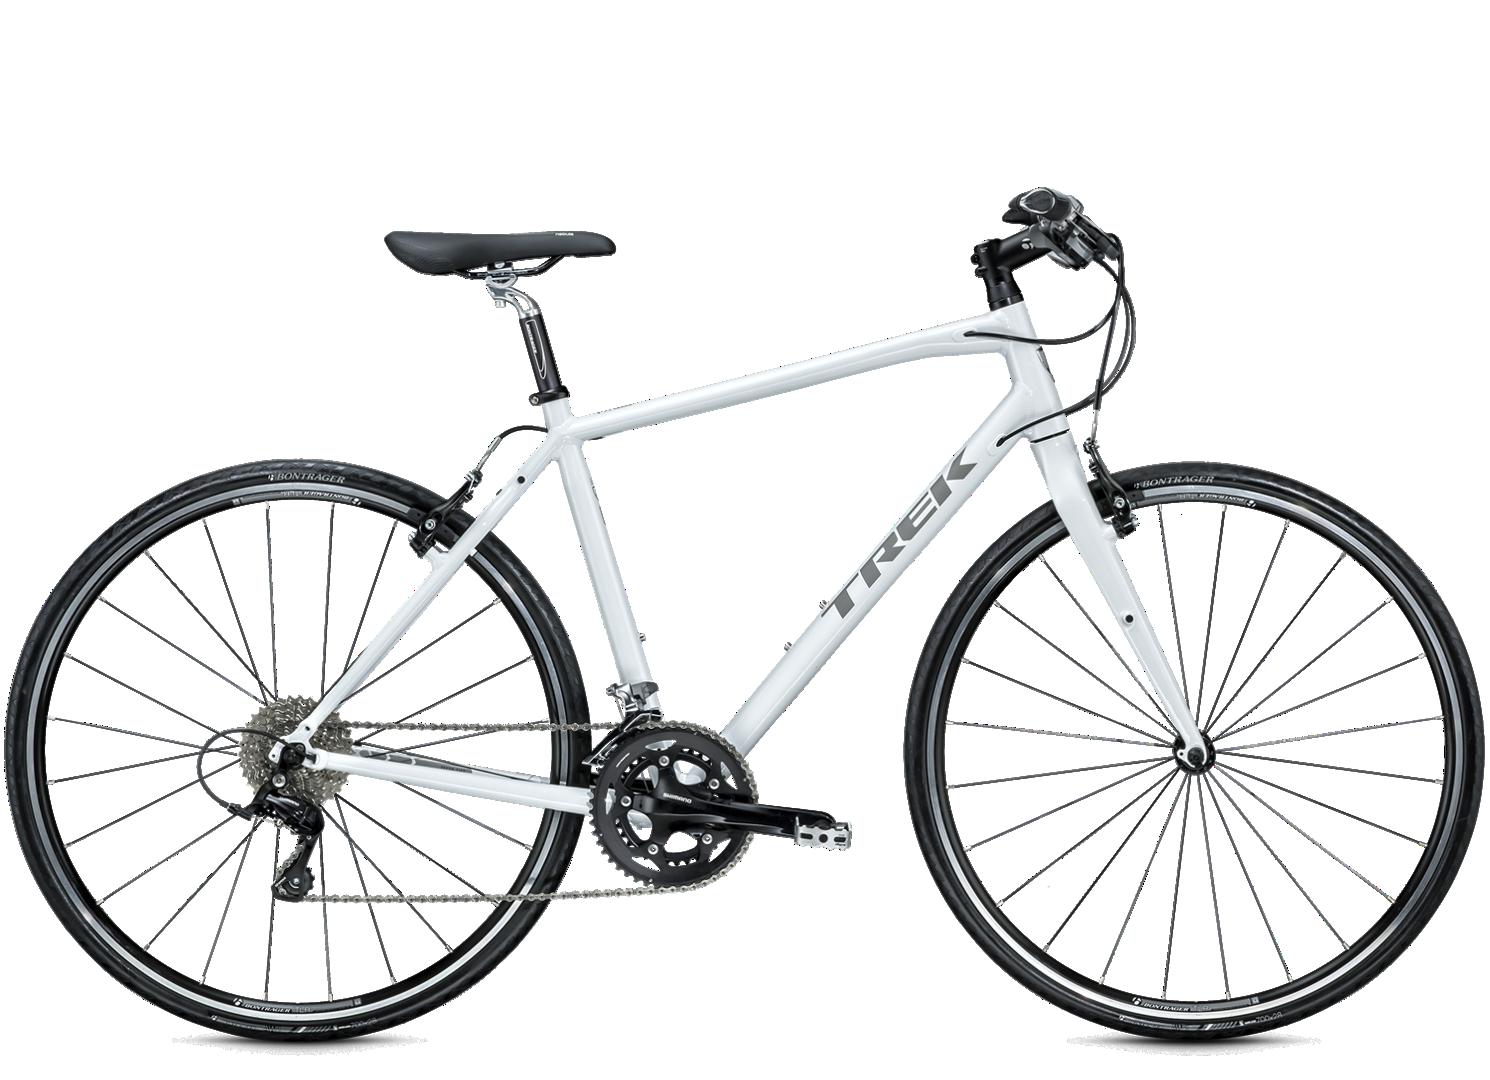 2015 7 5 FX - Bike Archive - Trek Bicycle